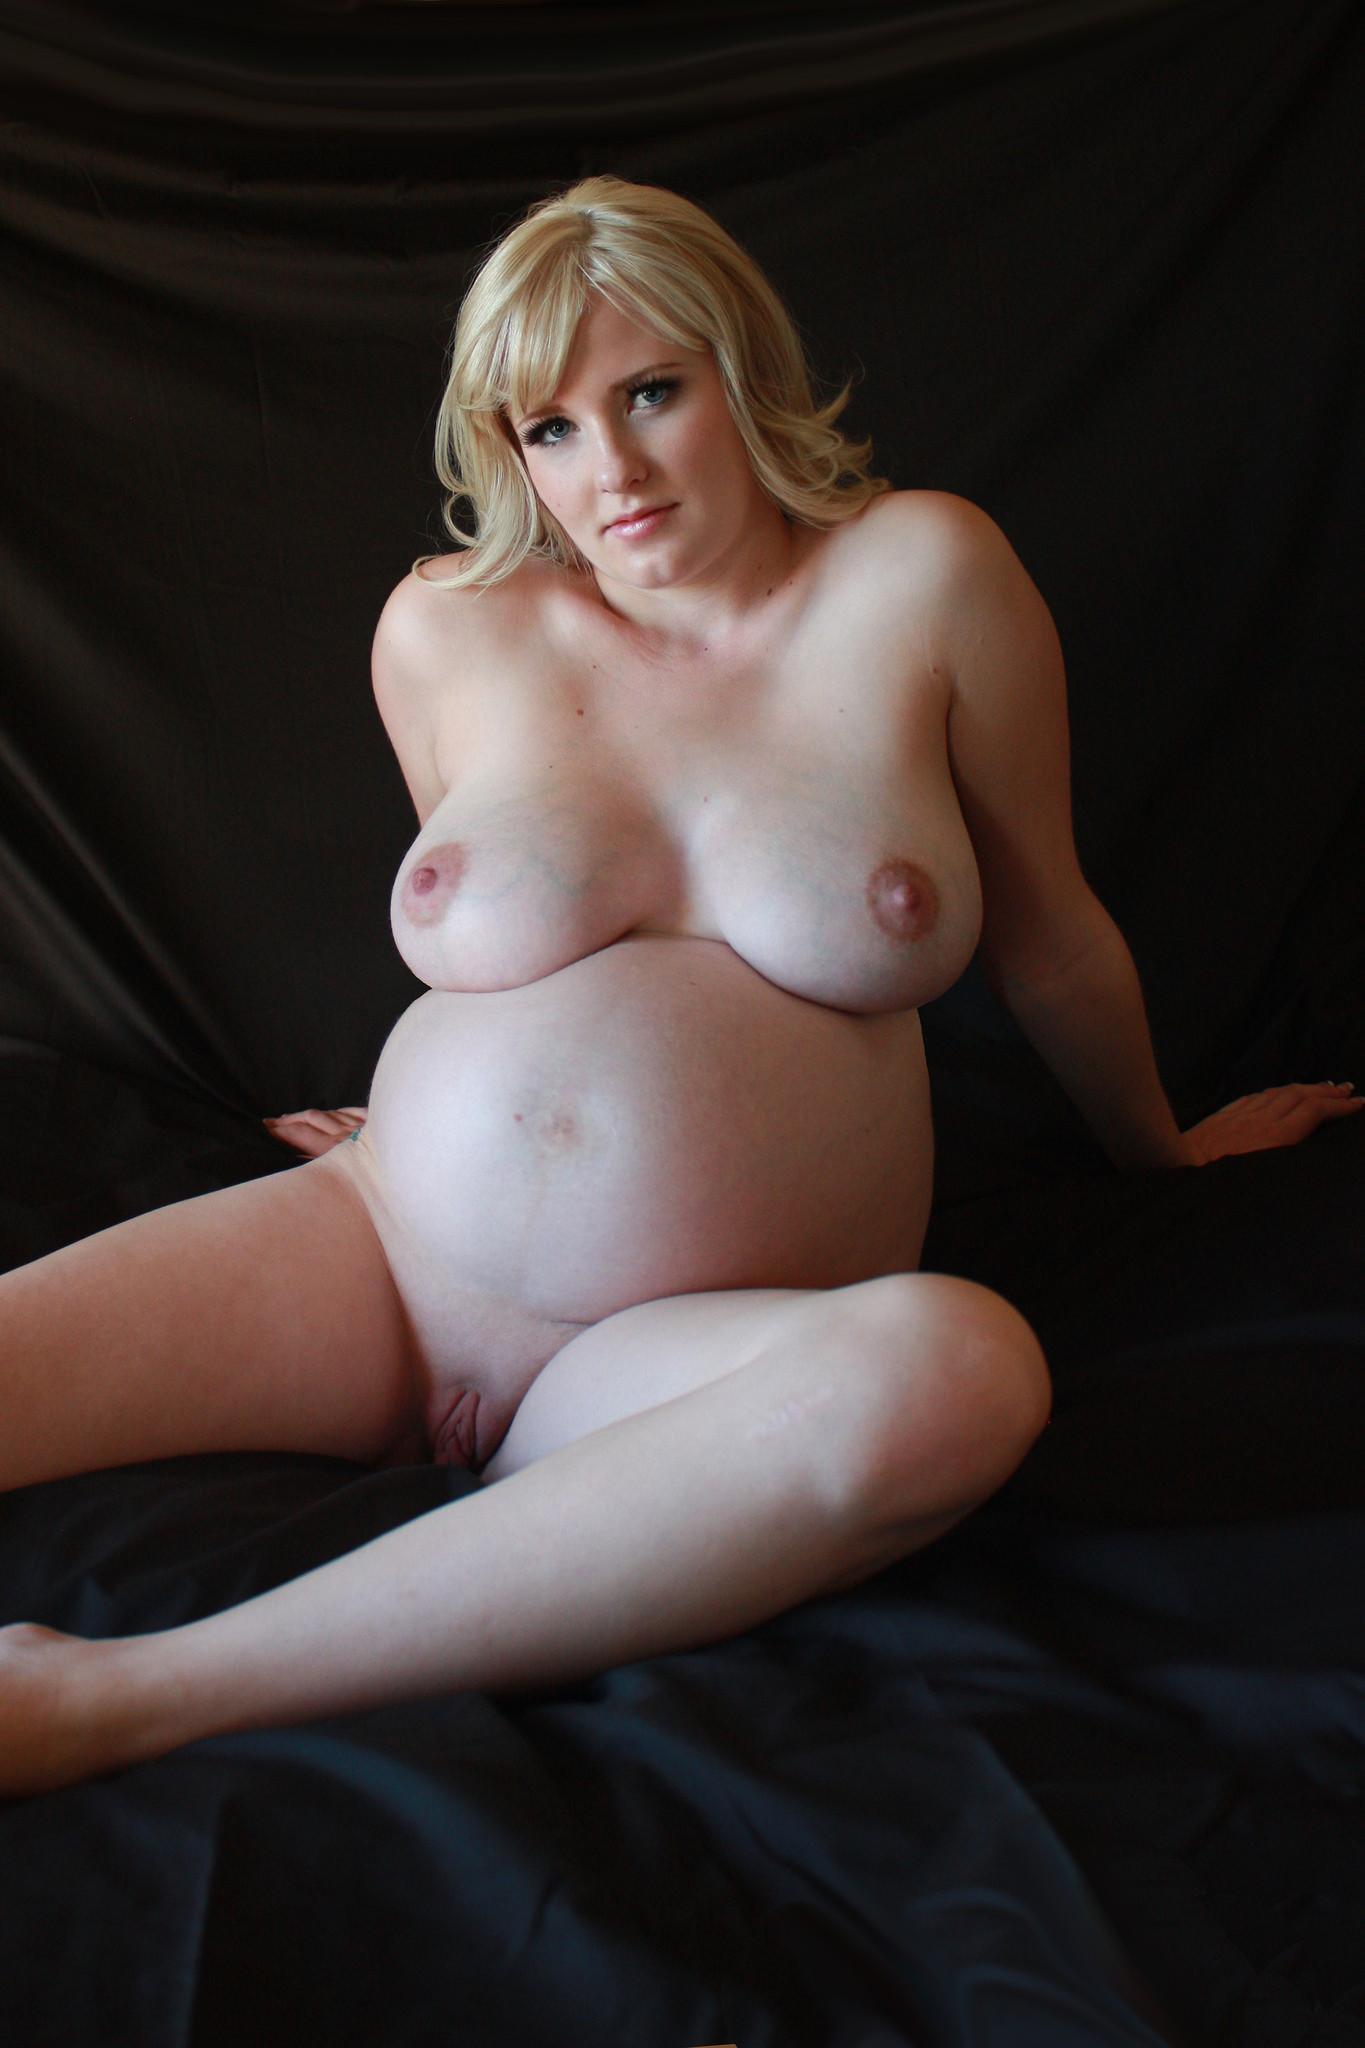 pregnant-big-tit-woman-naked